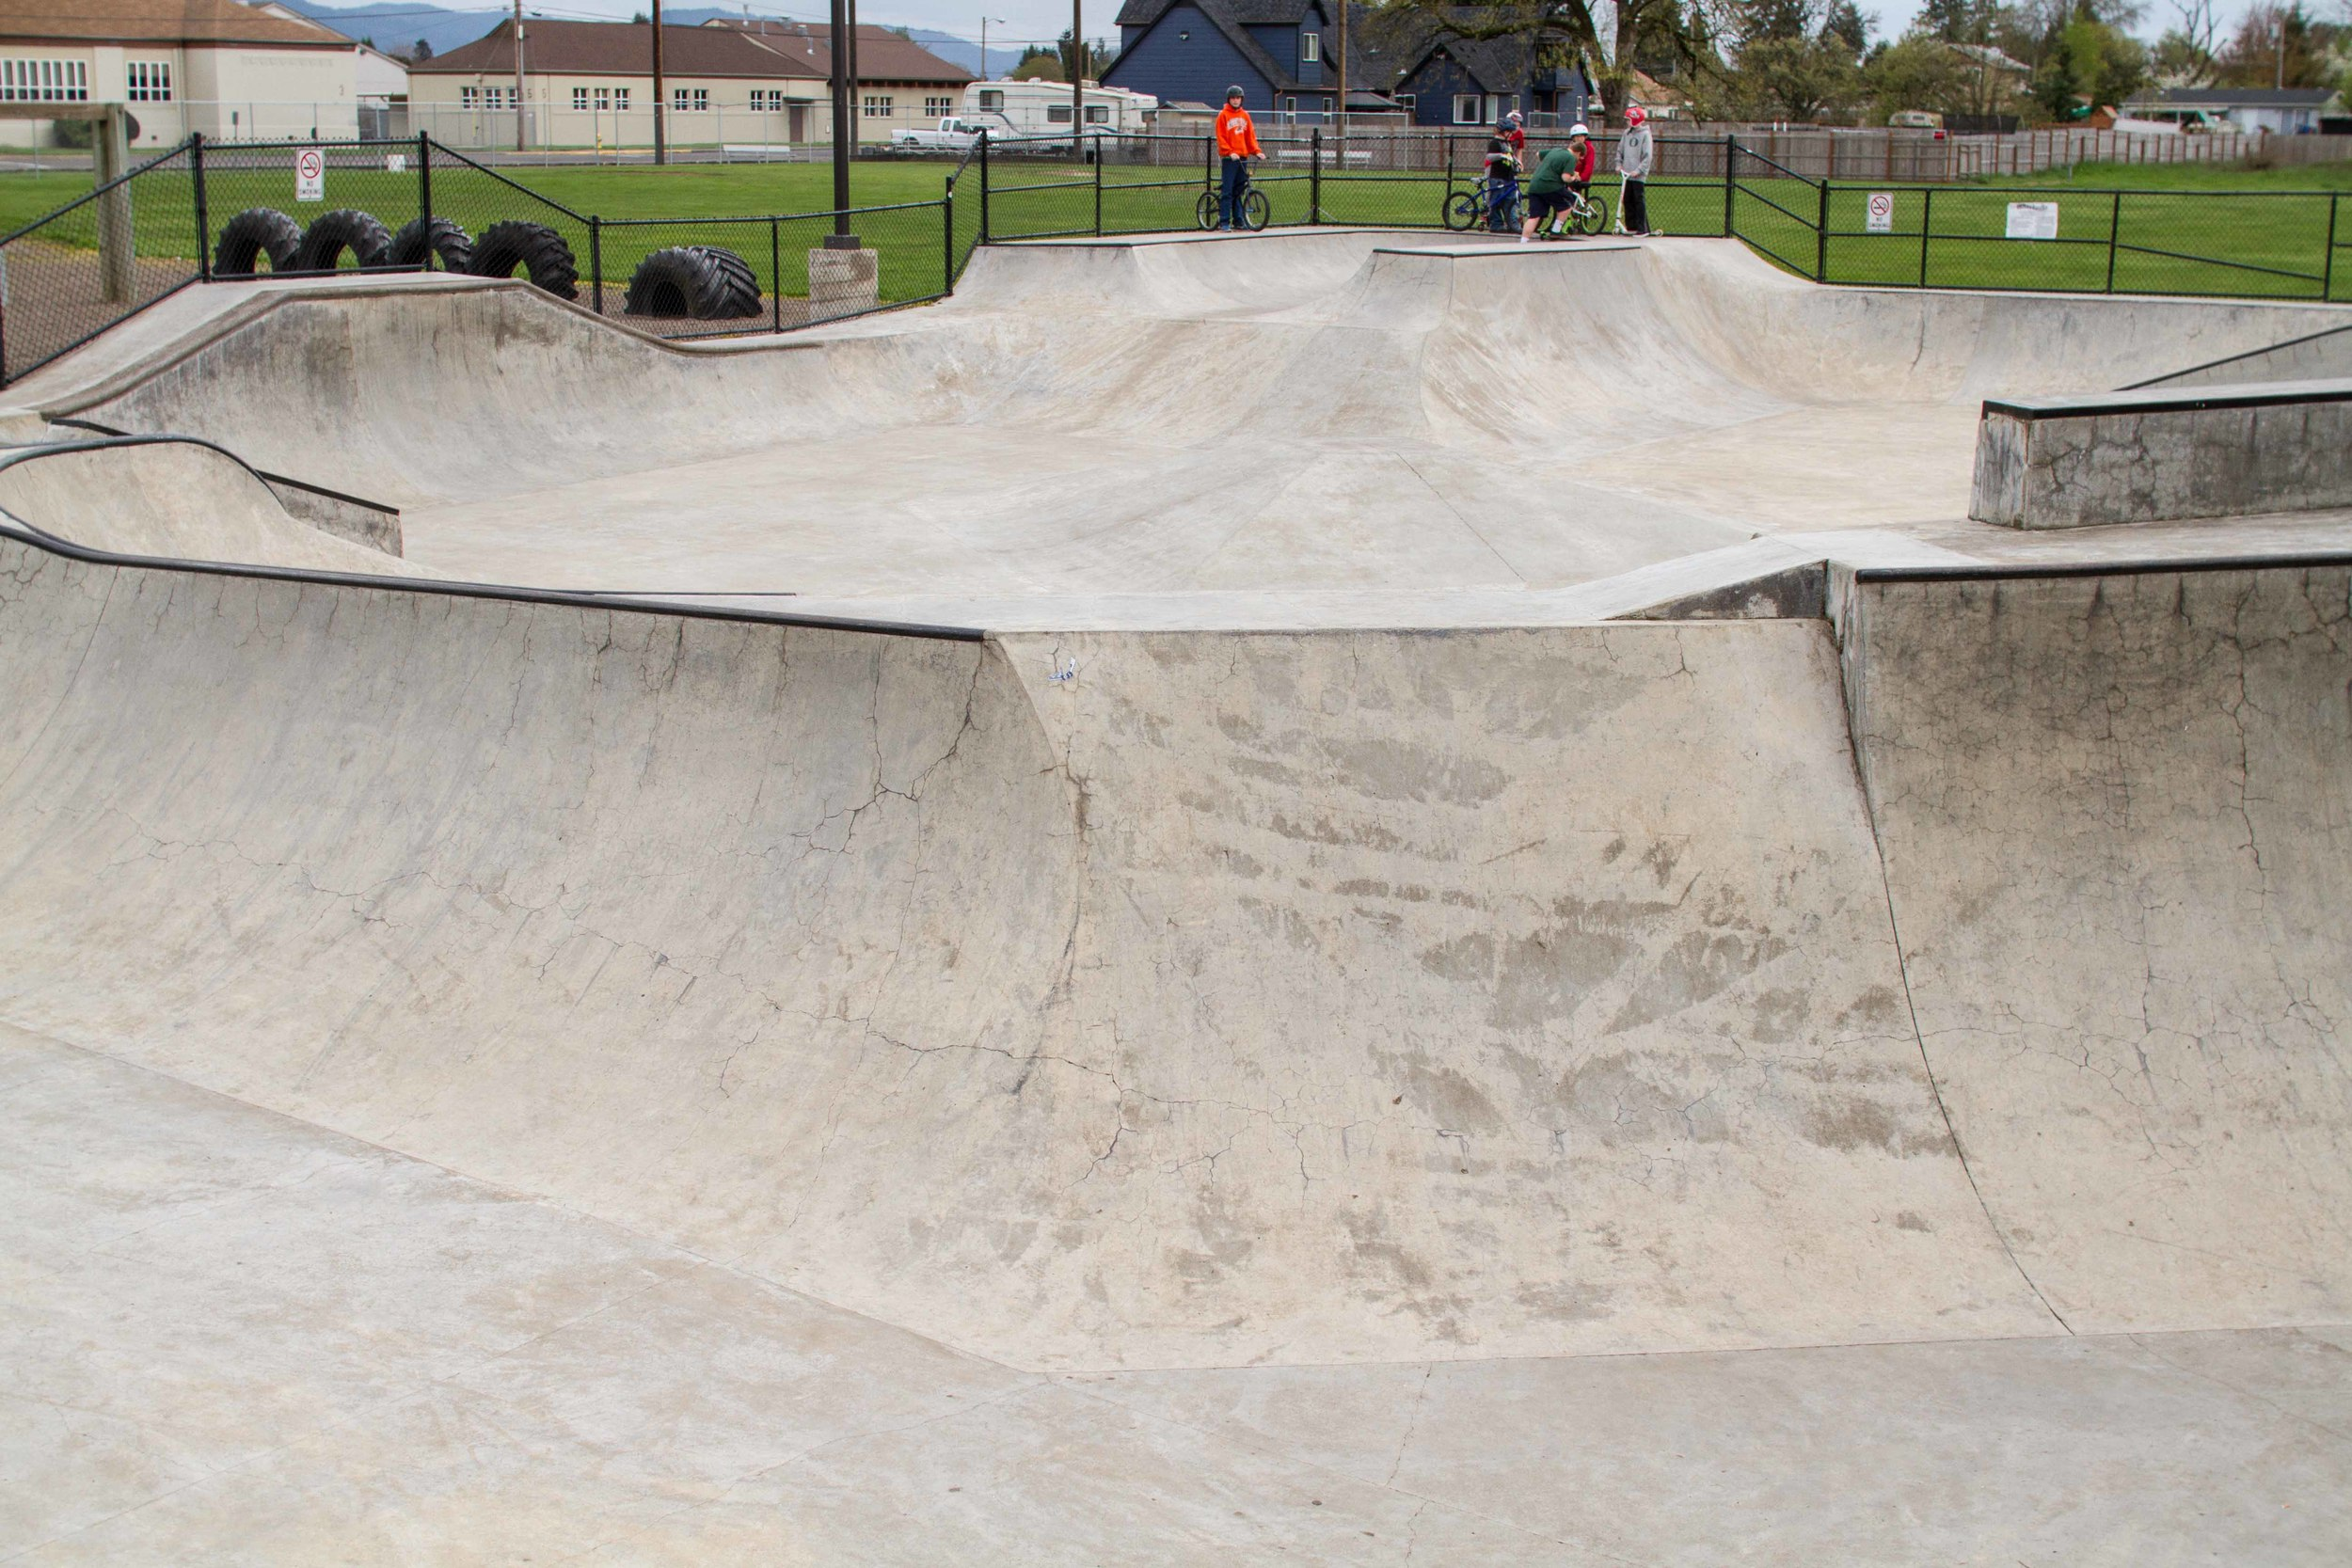 harrisburg skatepark, harrisburg, oregon